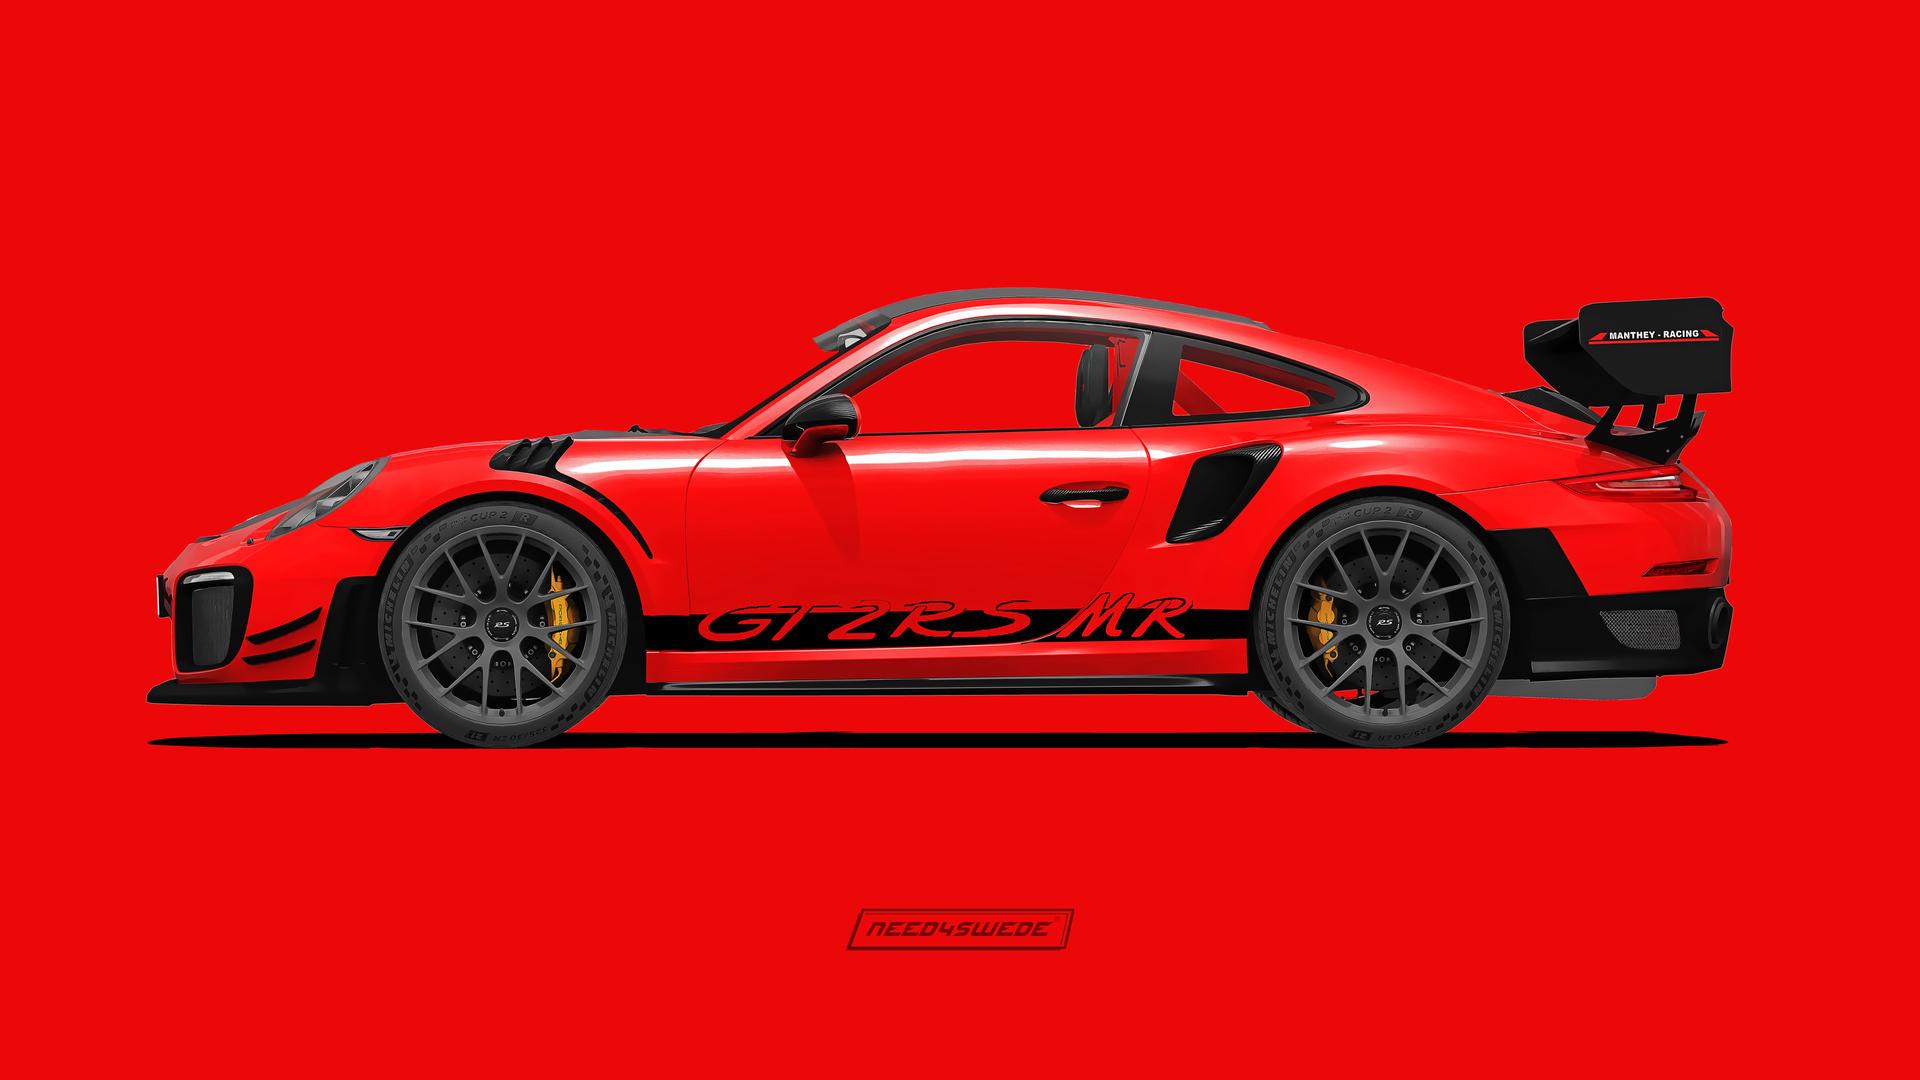 Porsche 911 Gt2 Rs Desktop Wallpaper By Need4swede On Deviantart